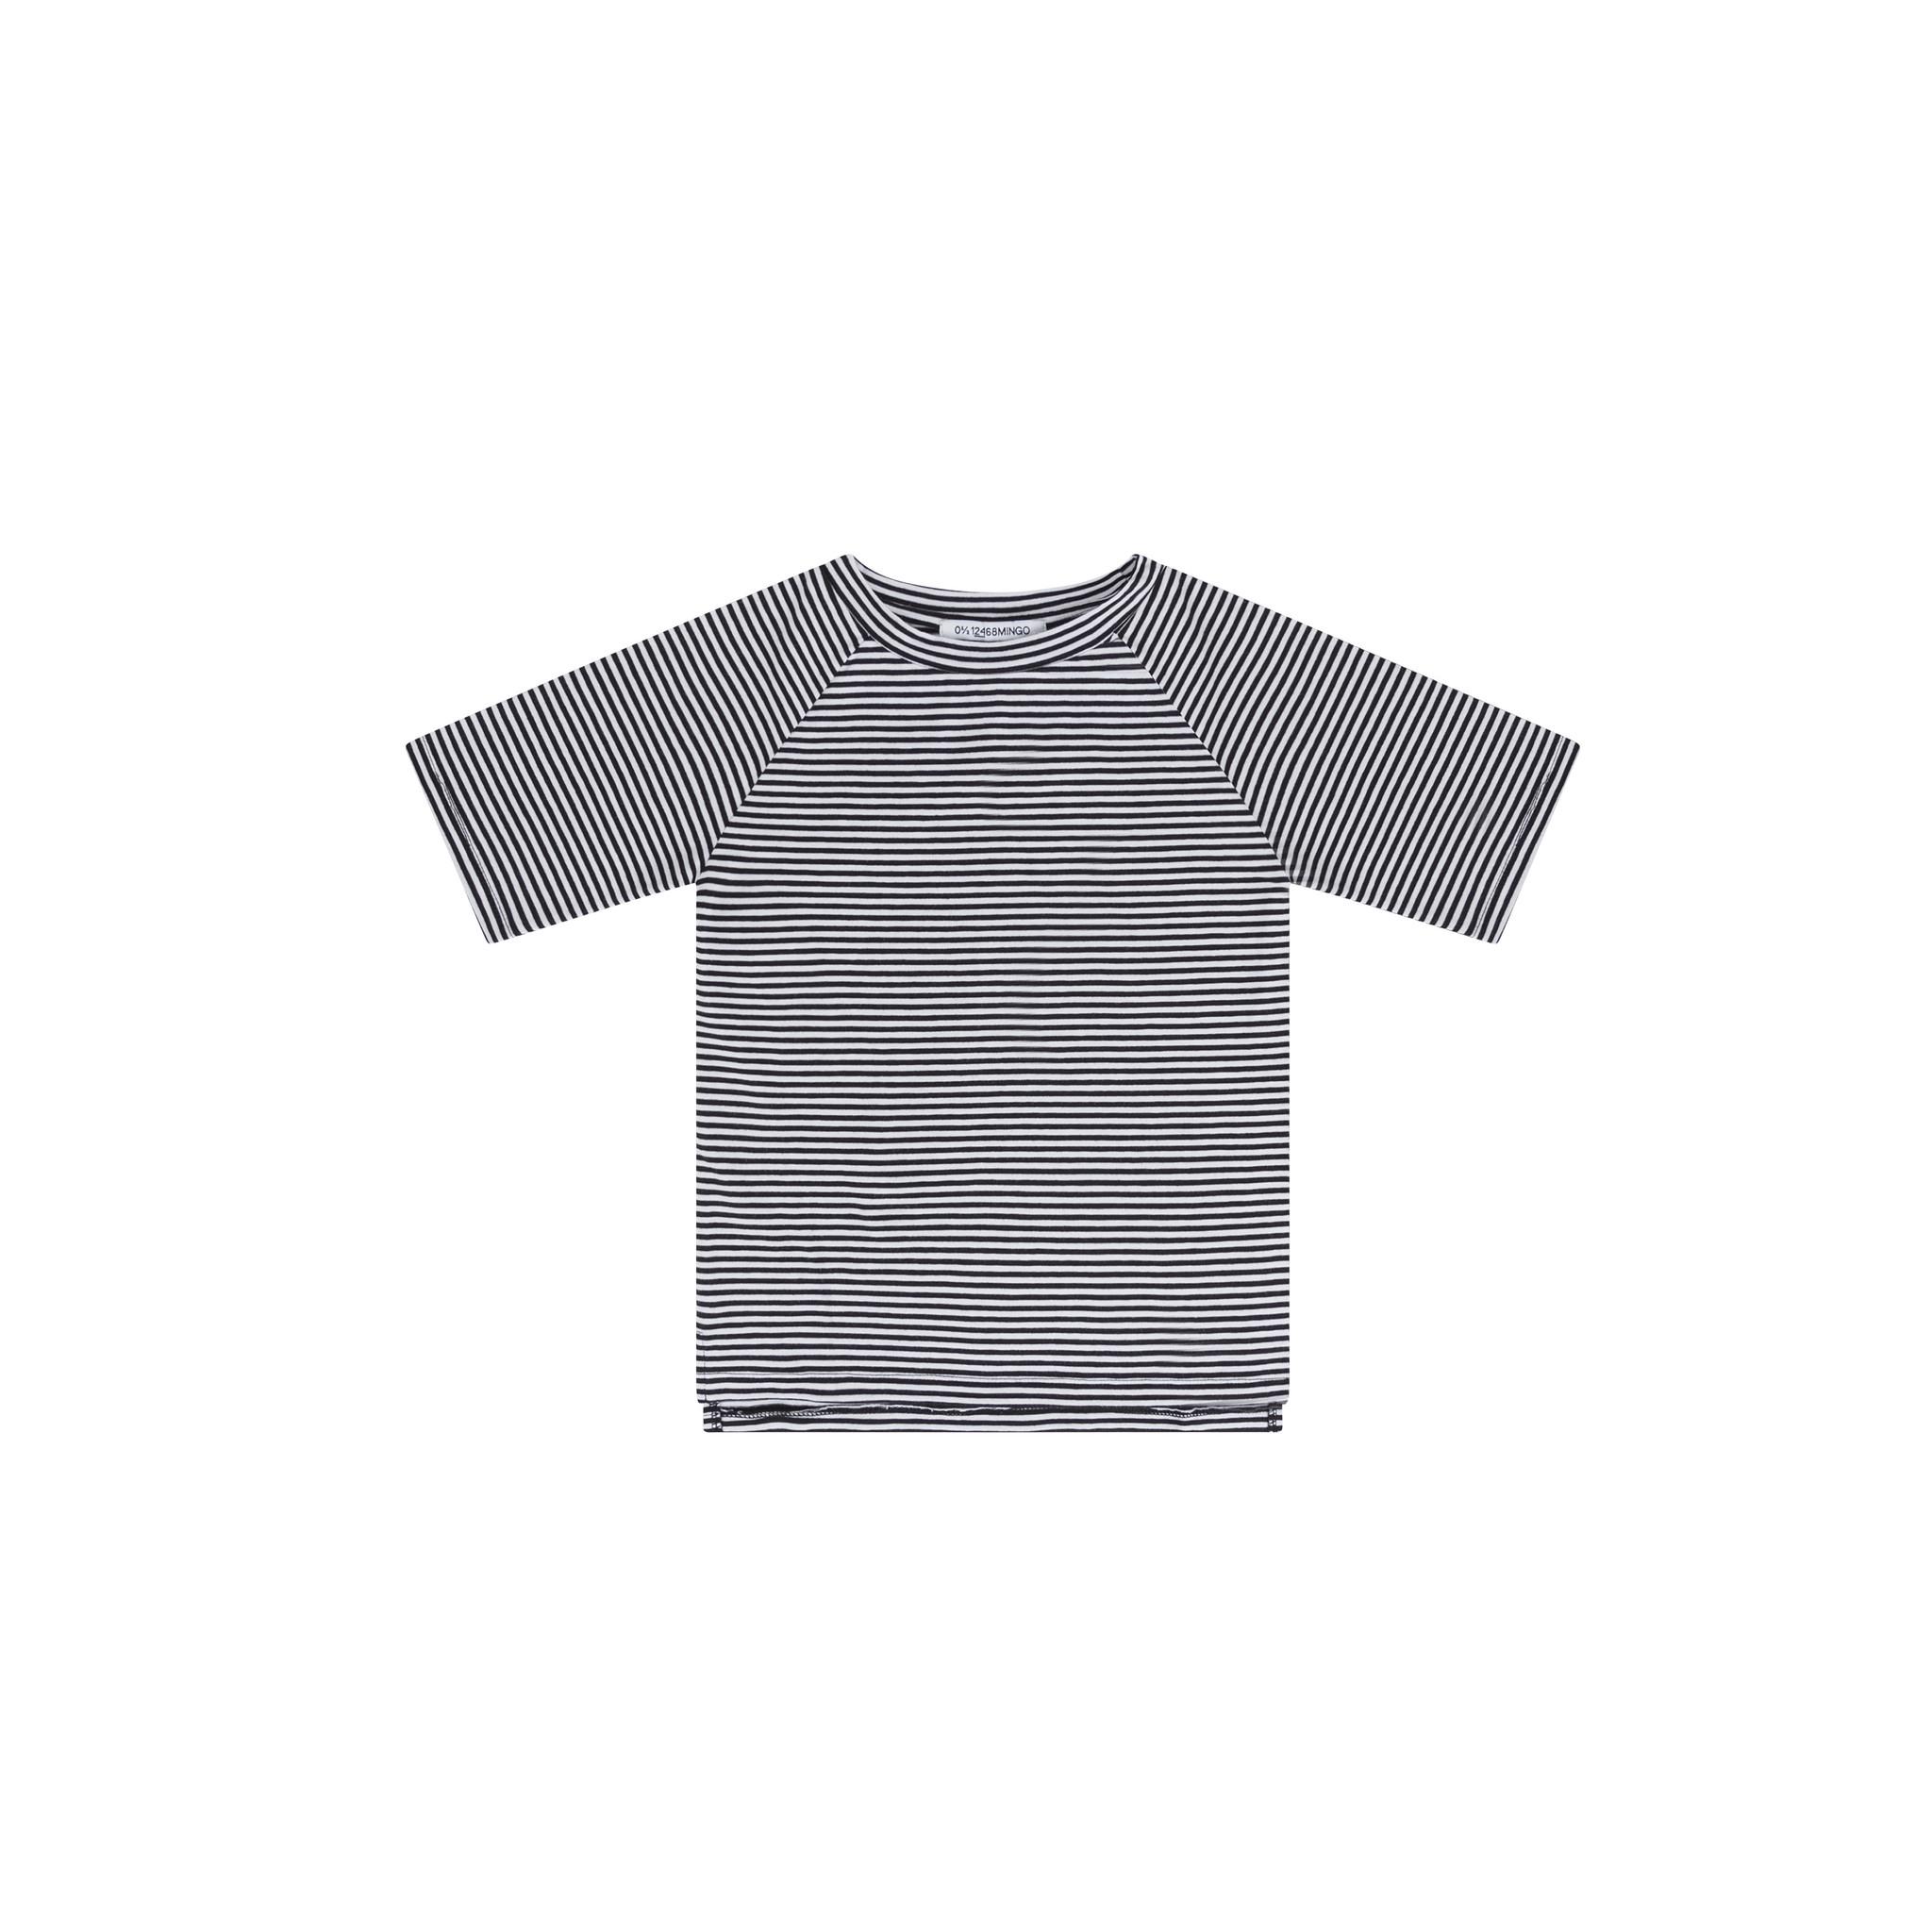 T-Shirt - B/W Stripes-1